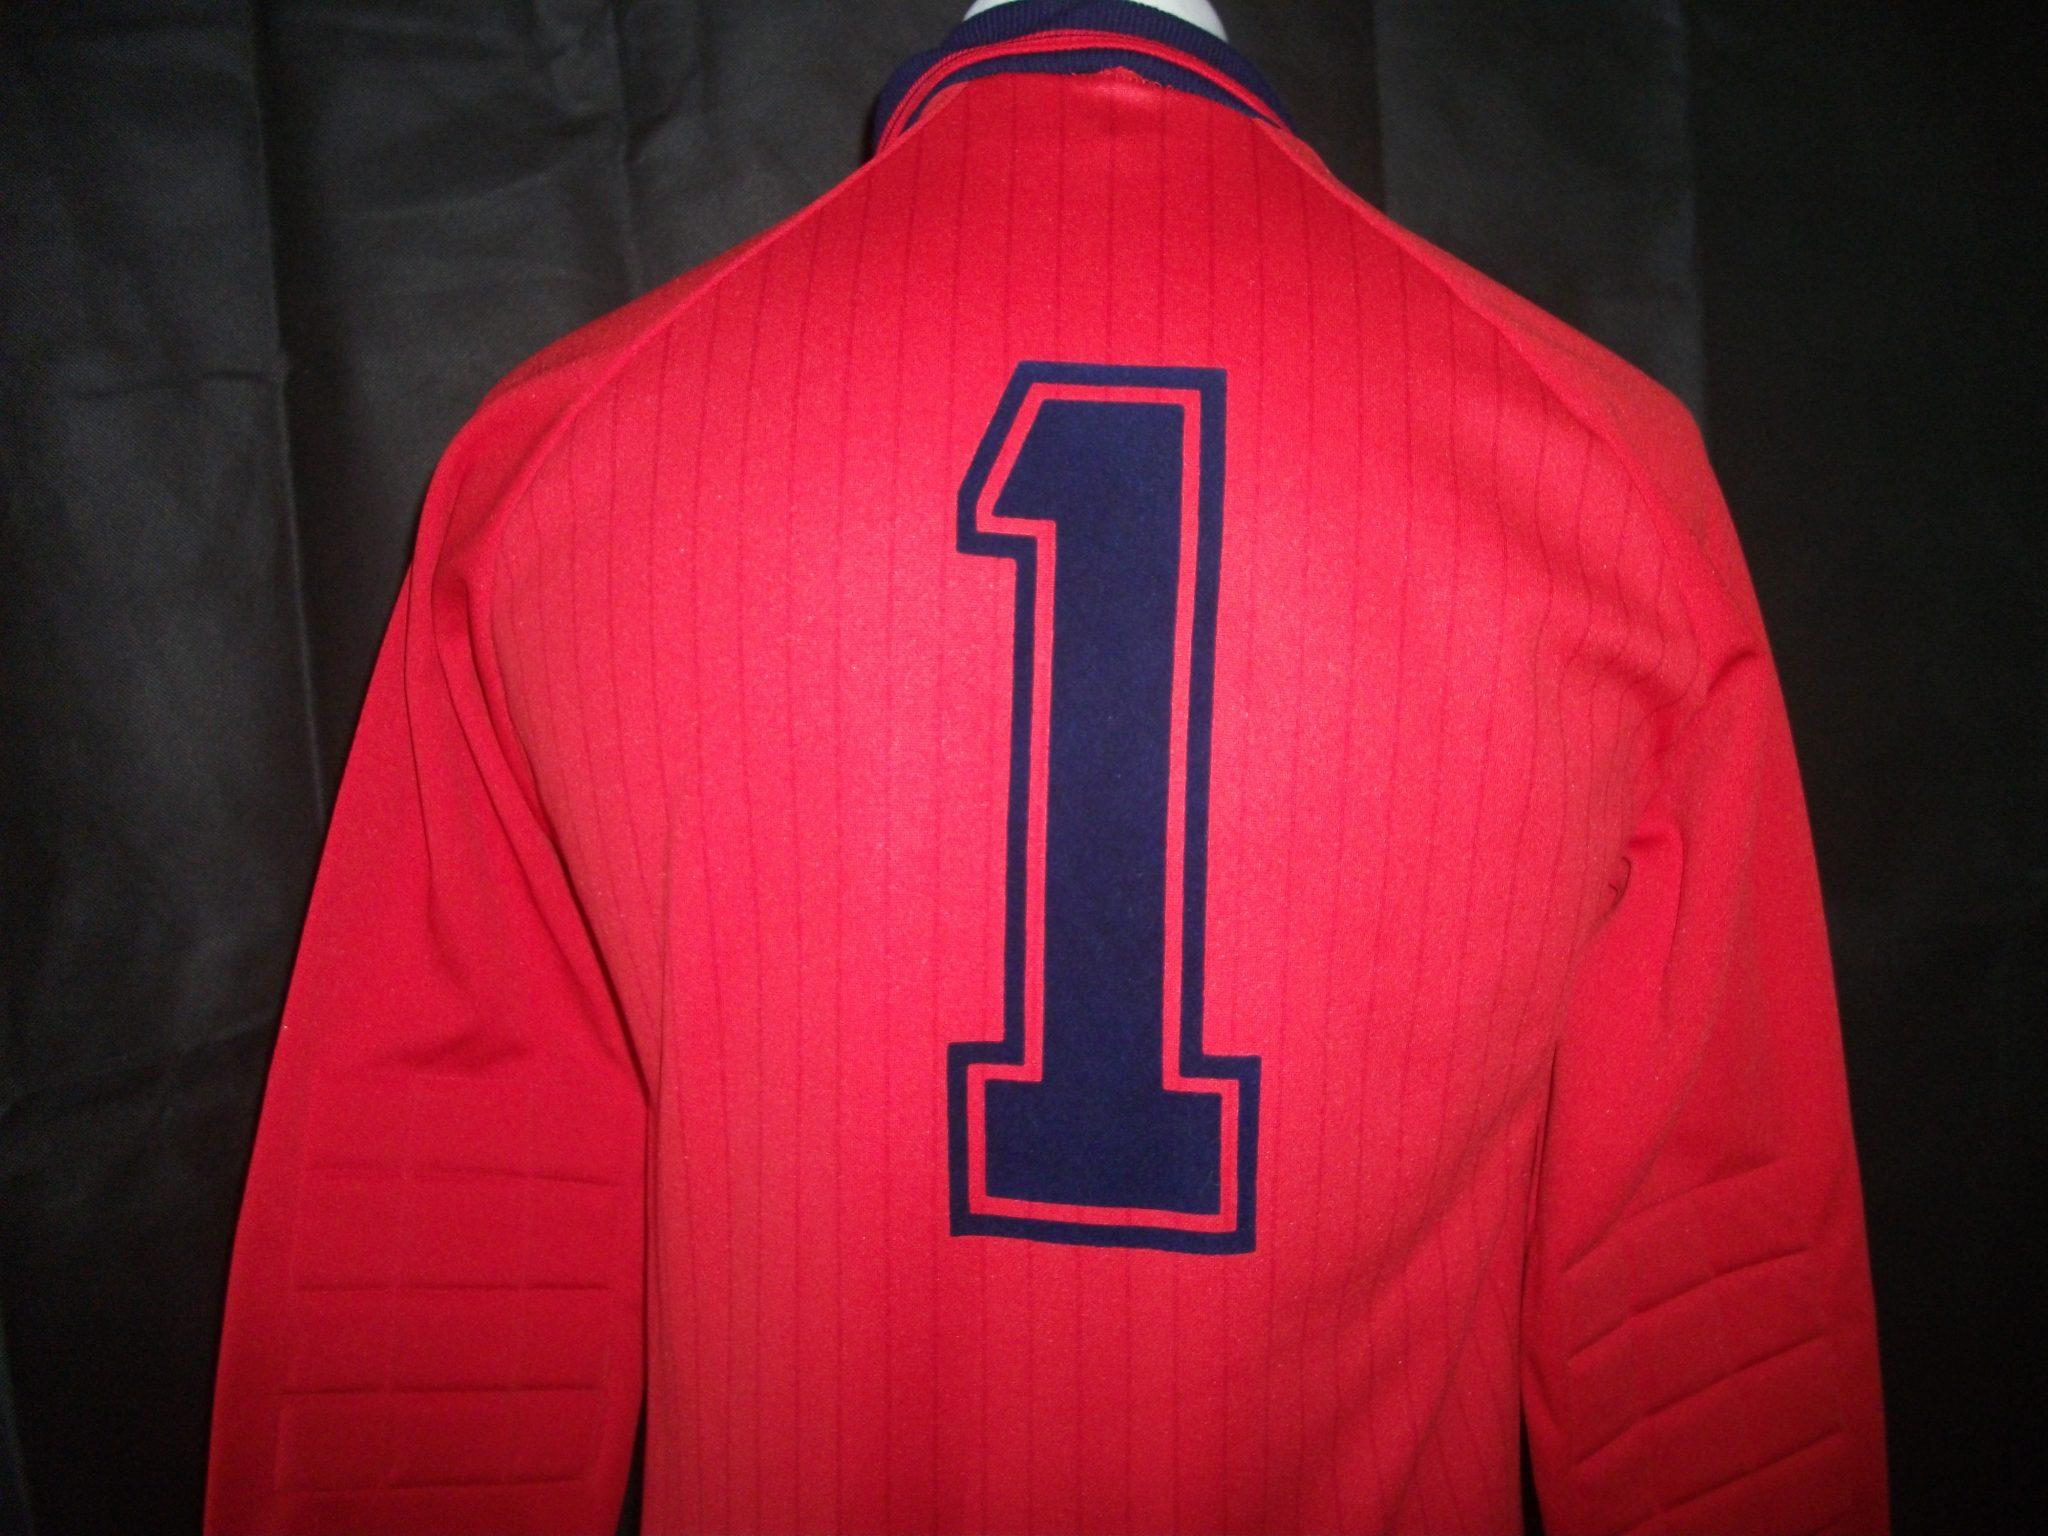 f8f624f52bc Vintage Umbro 1970's/80's Arsenal Goalkeeper prototype shirt.5 - On ...